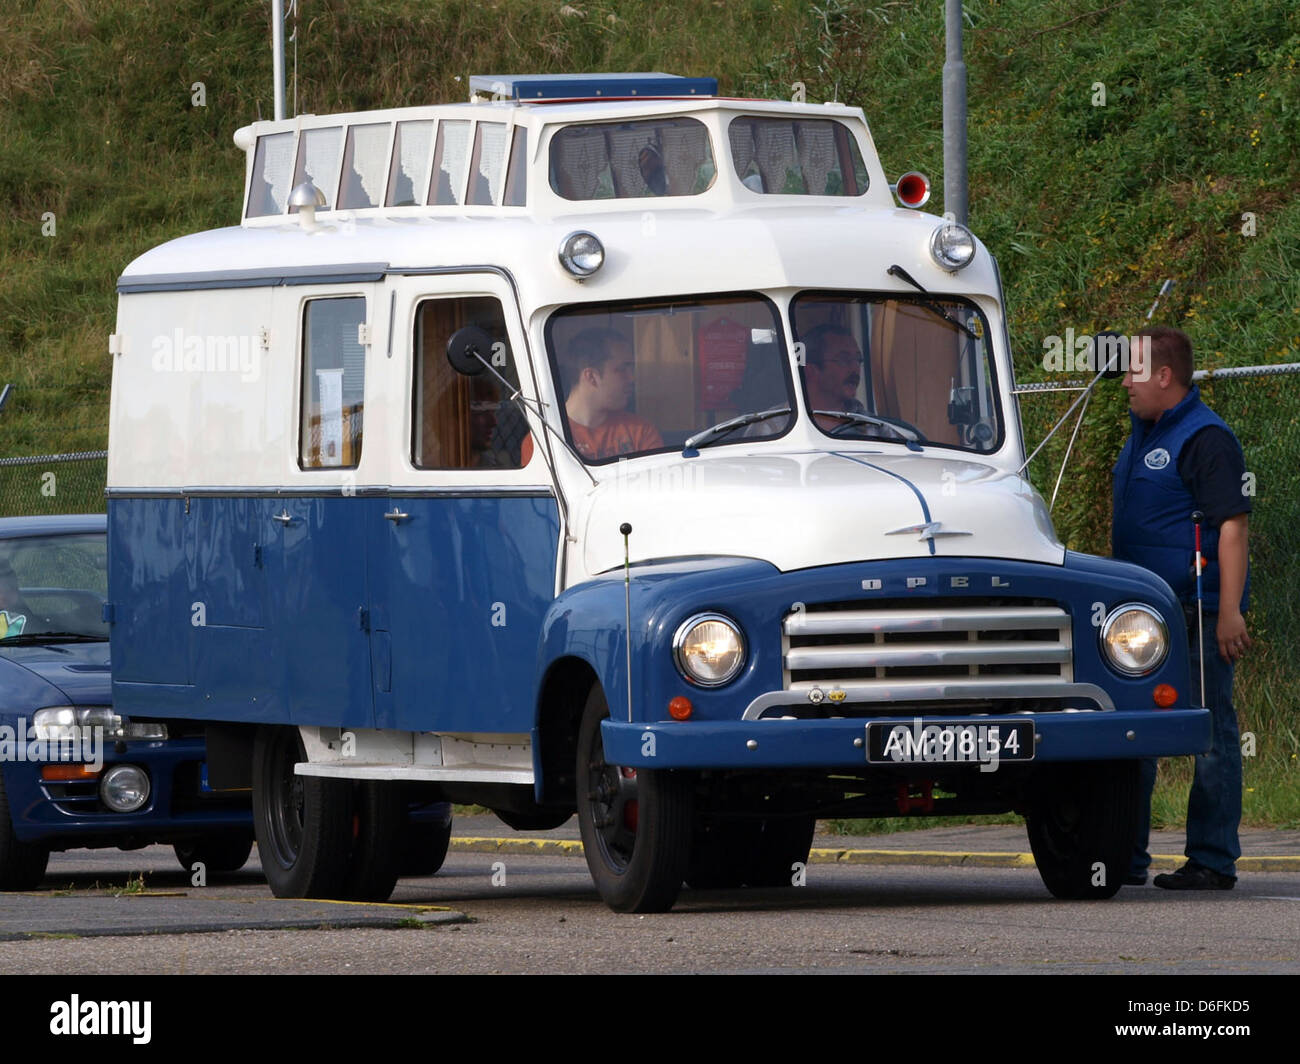 8 Opel Blitz camper Stock Photo - Alamy